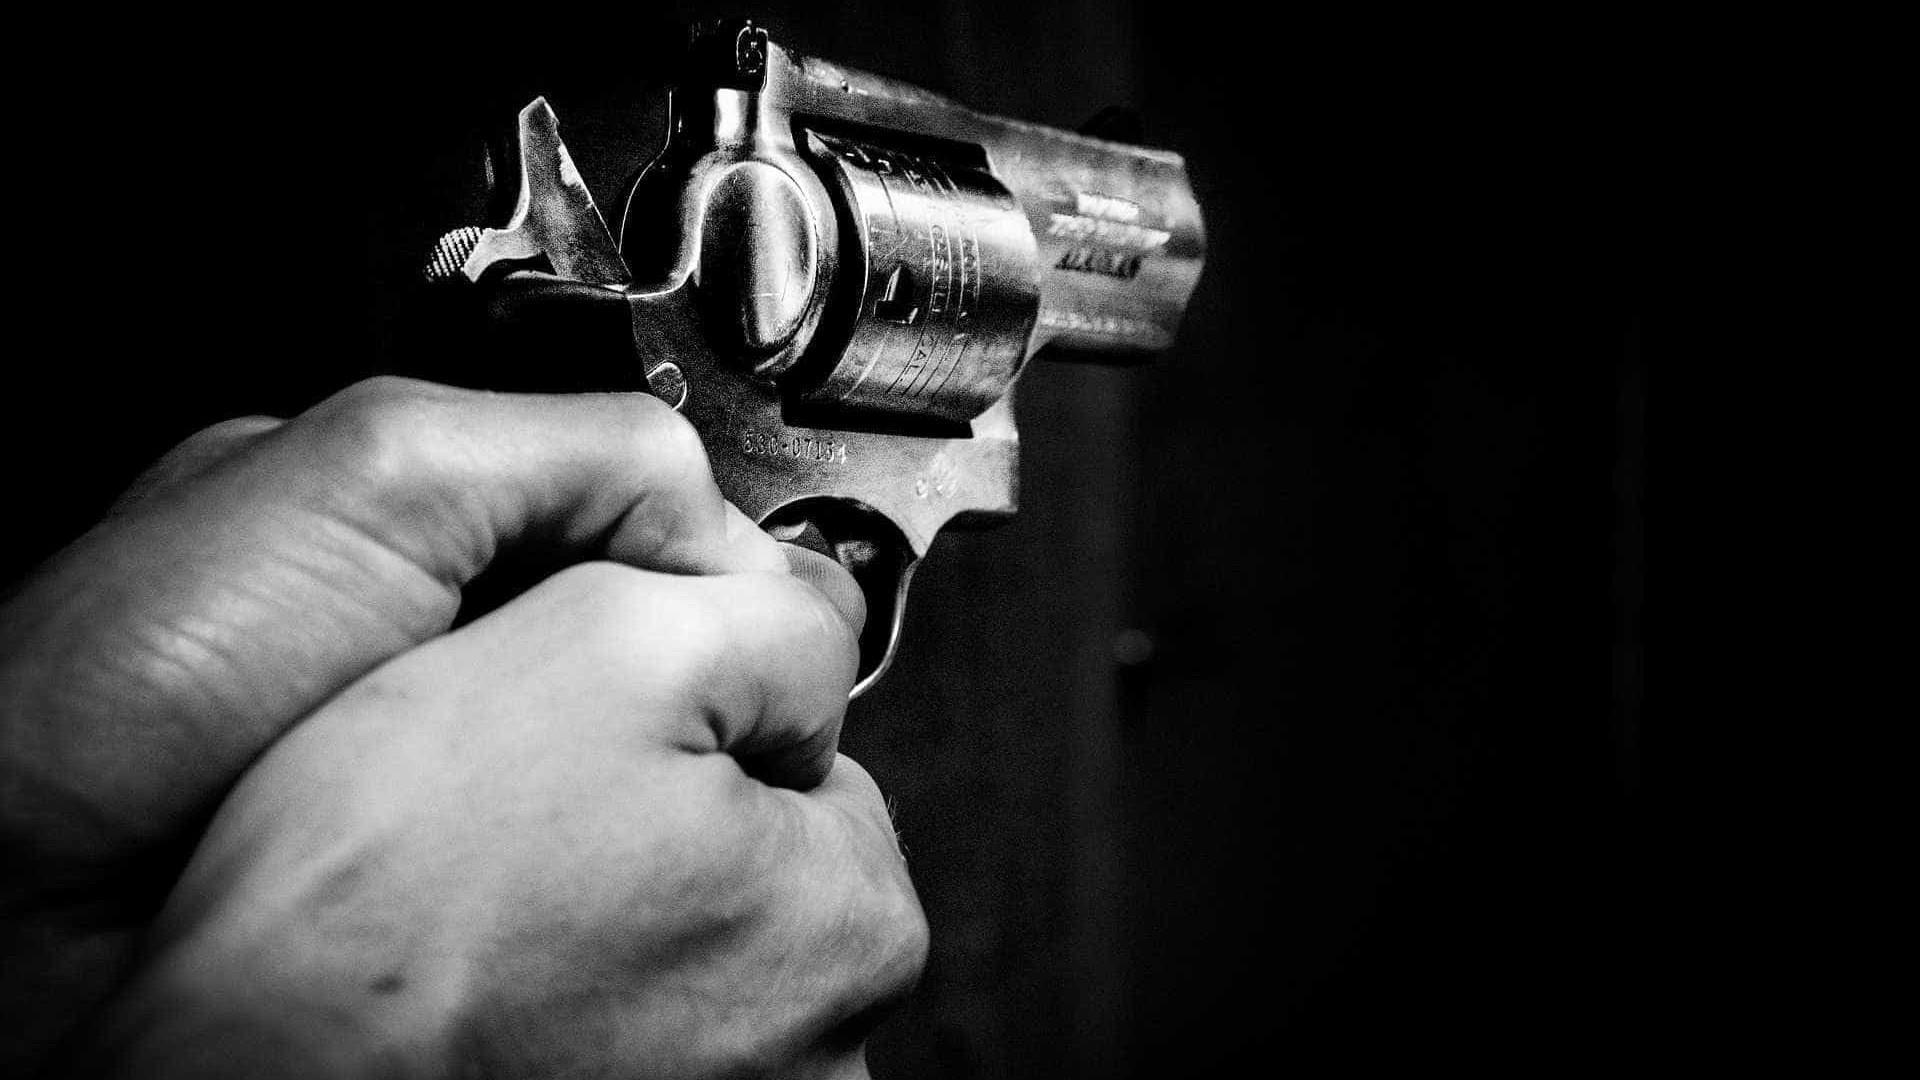 Policial militar tentar evitar assalto e é morto a tiros no Rio